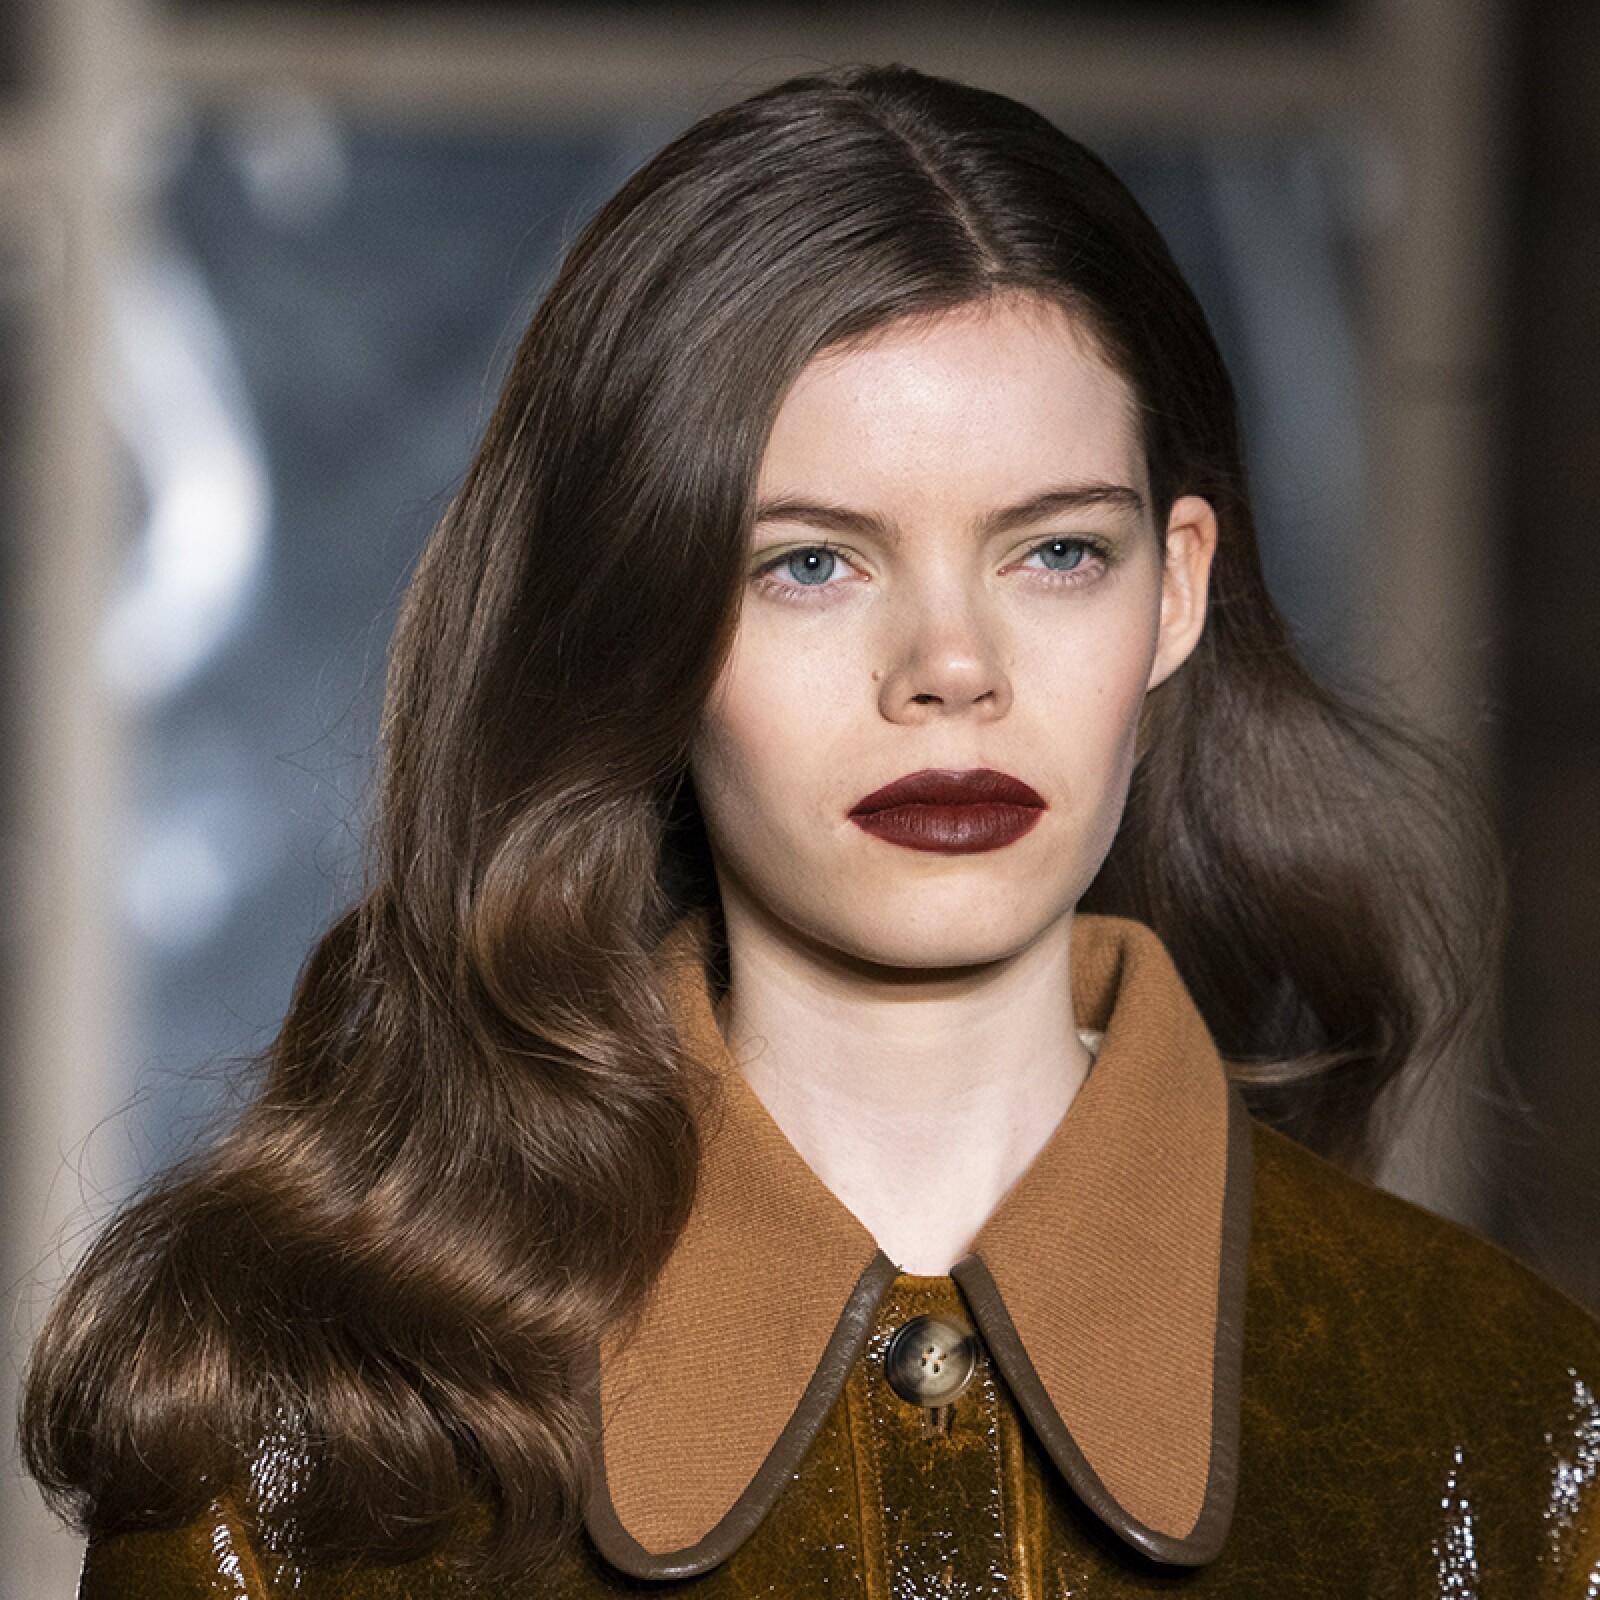 lfw-fashion-week-runway-beauty-looks-maquillaje-rejinapyo